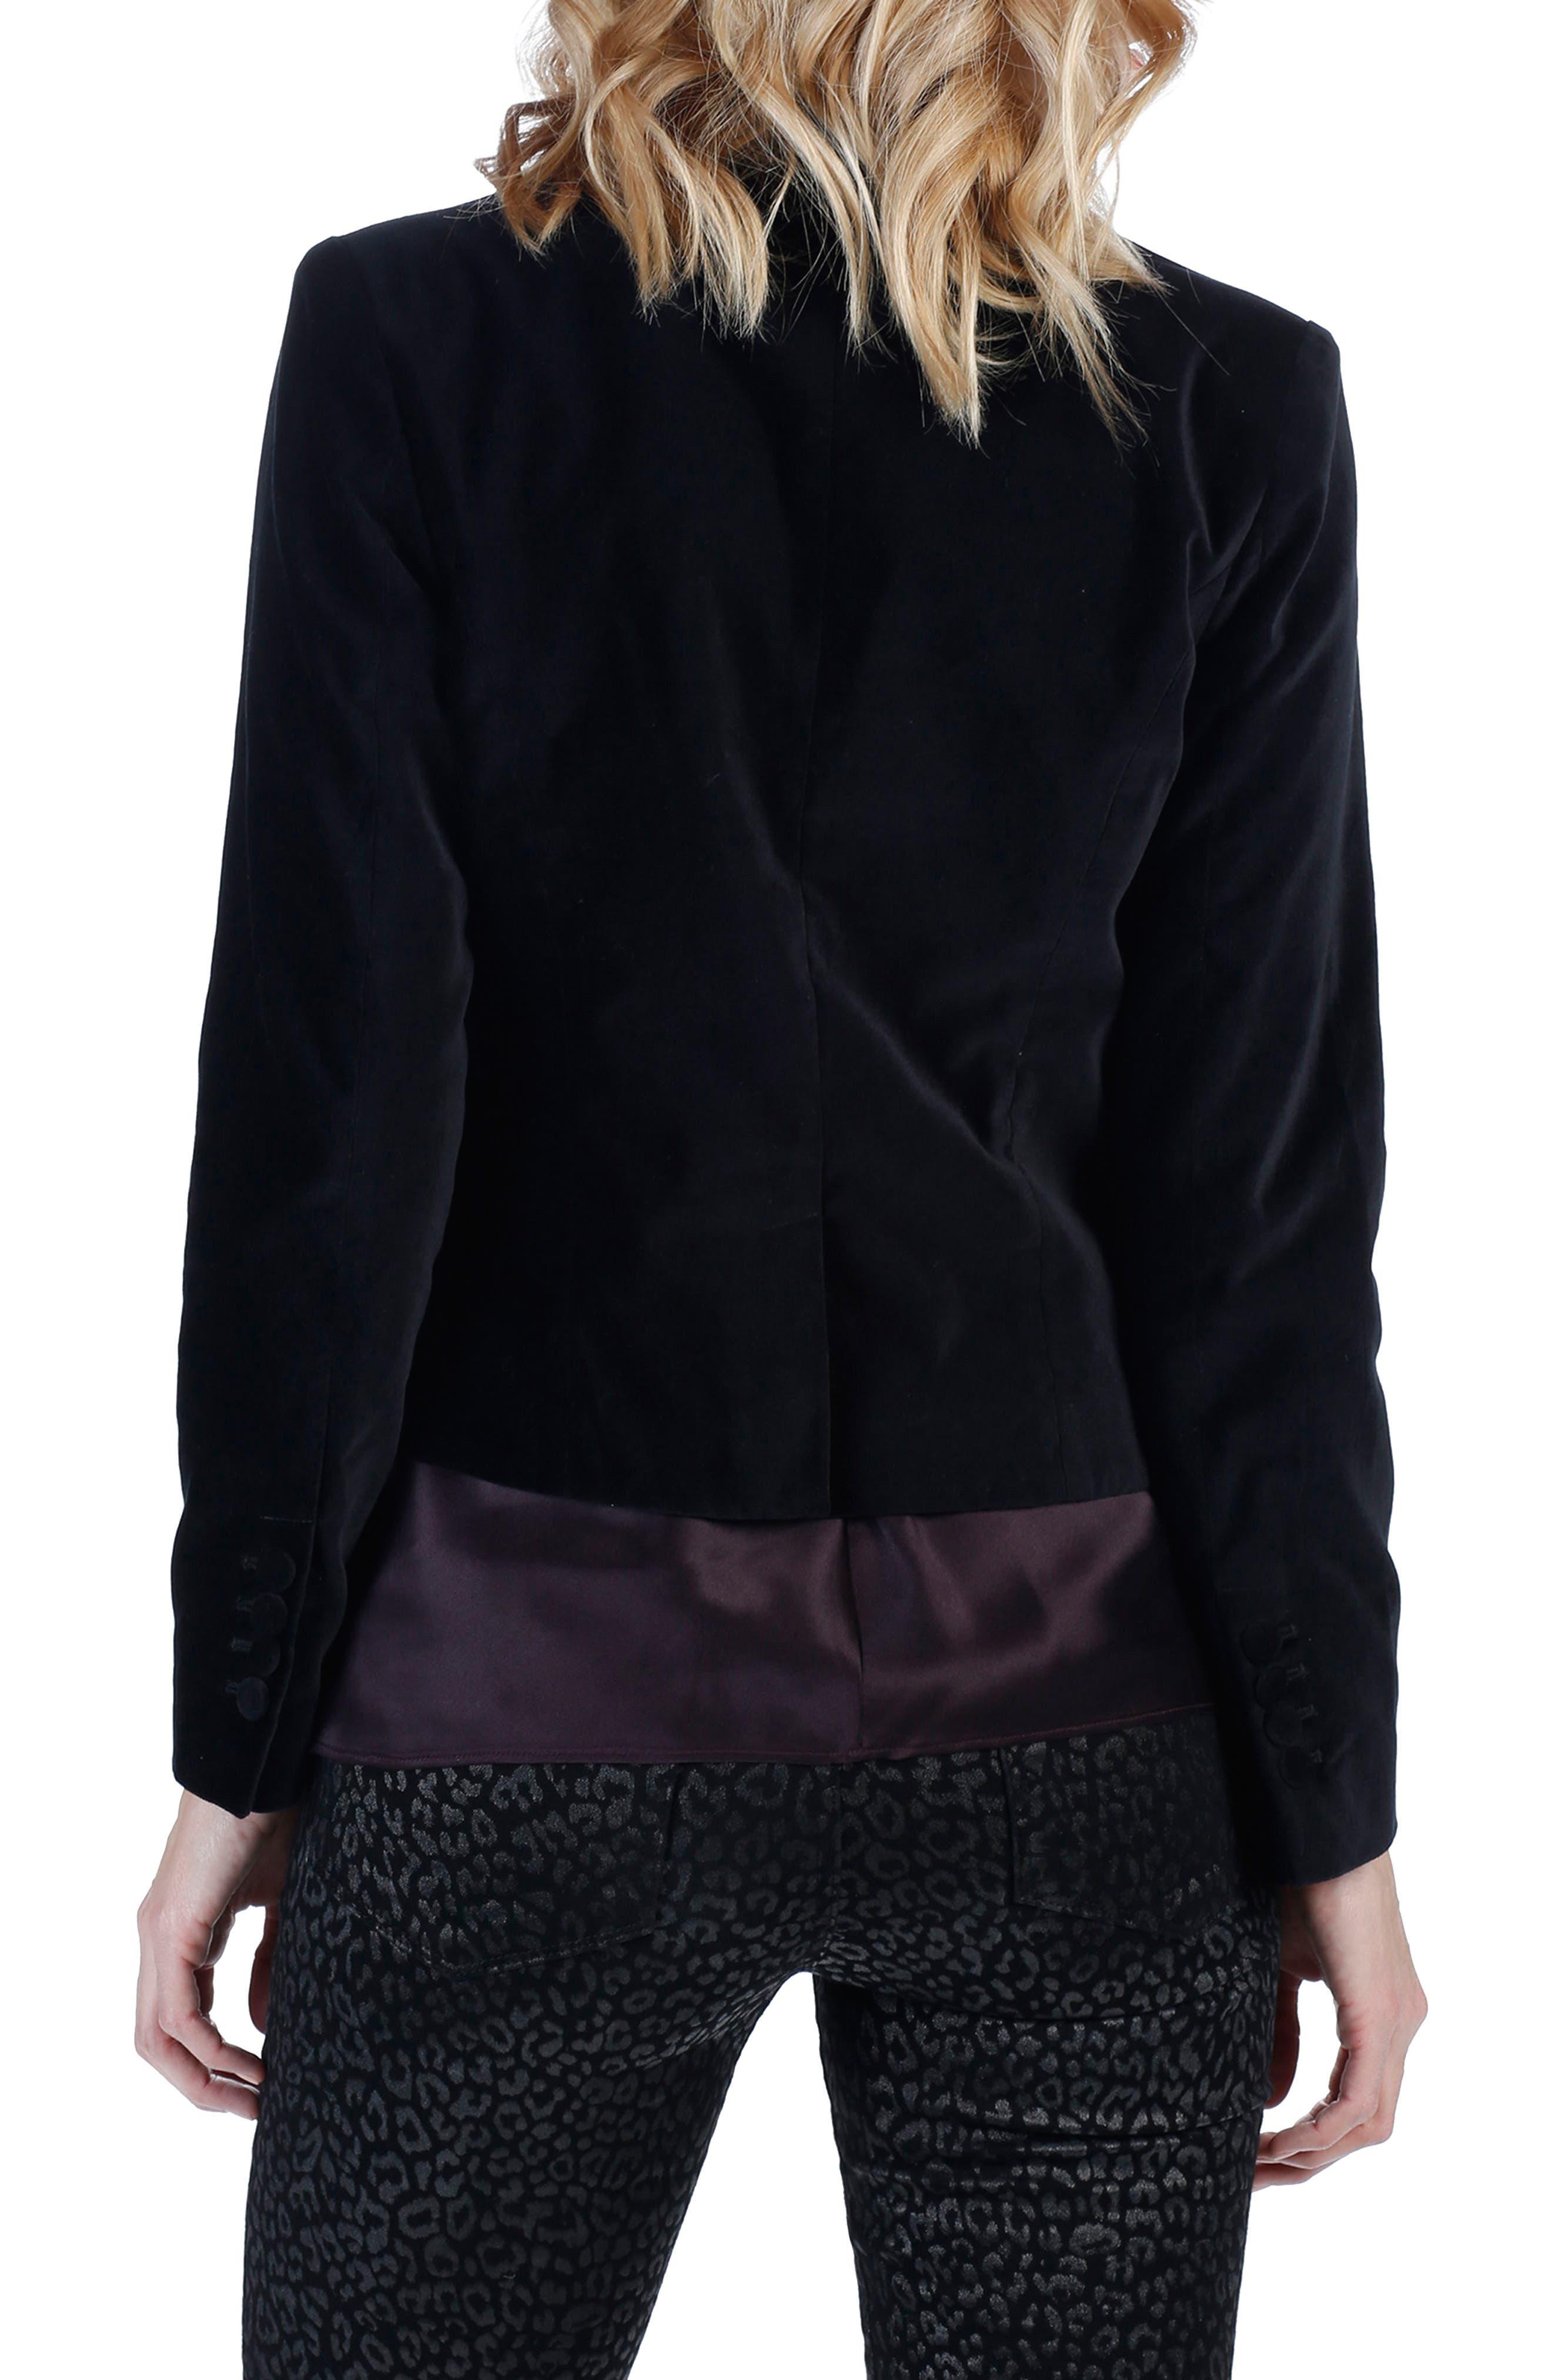 Camilia Leather Lapel Velvet Jacket,                             Alternate thumbnail 2, color,                             001